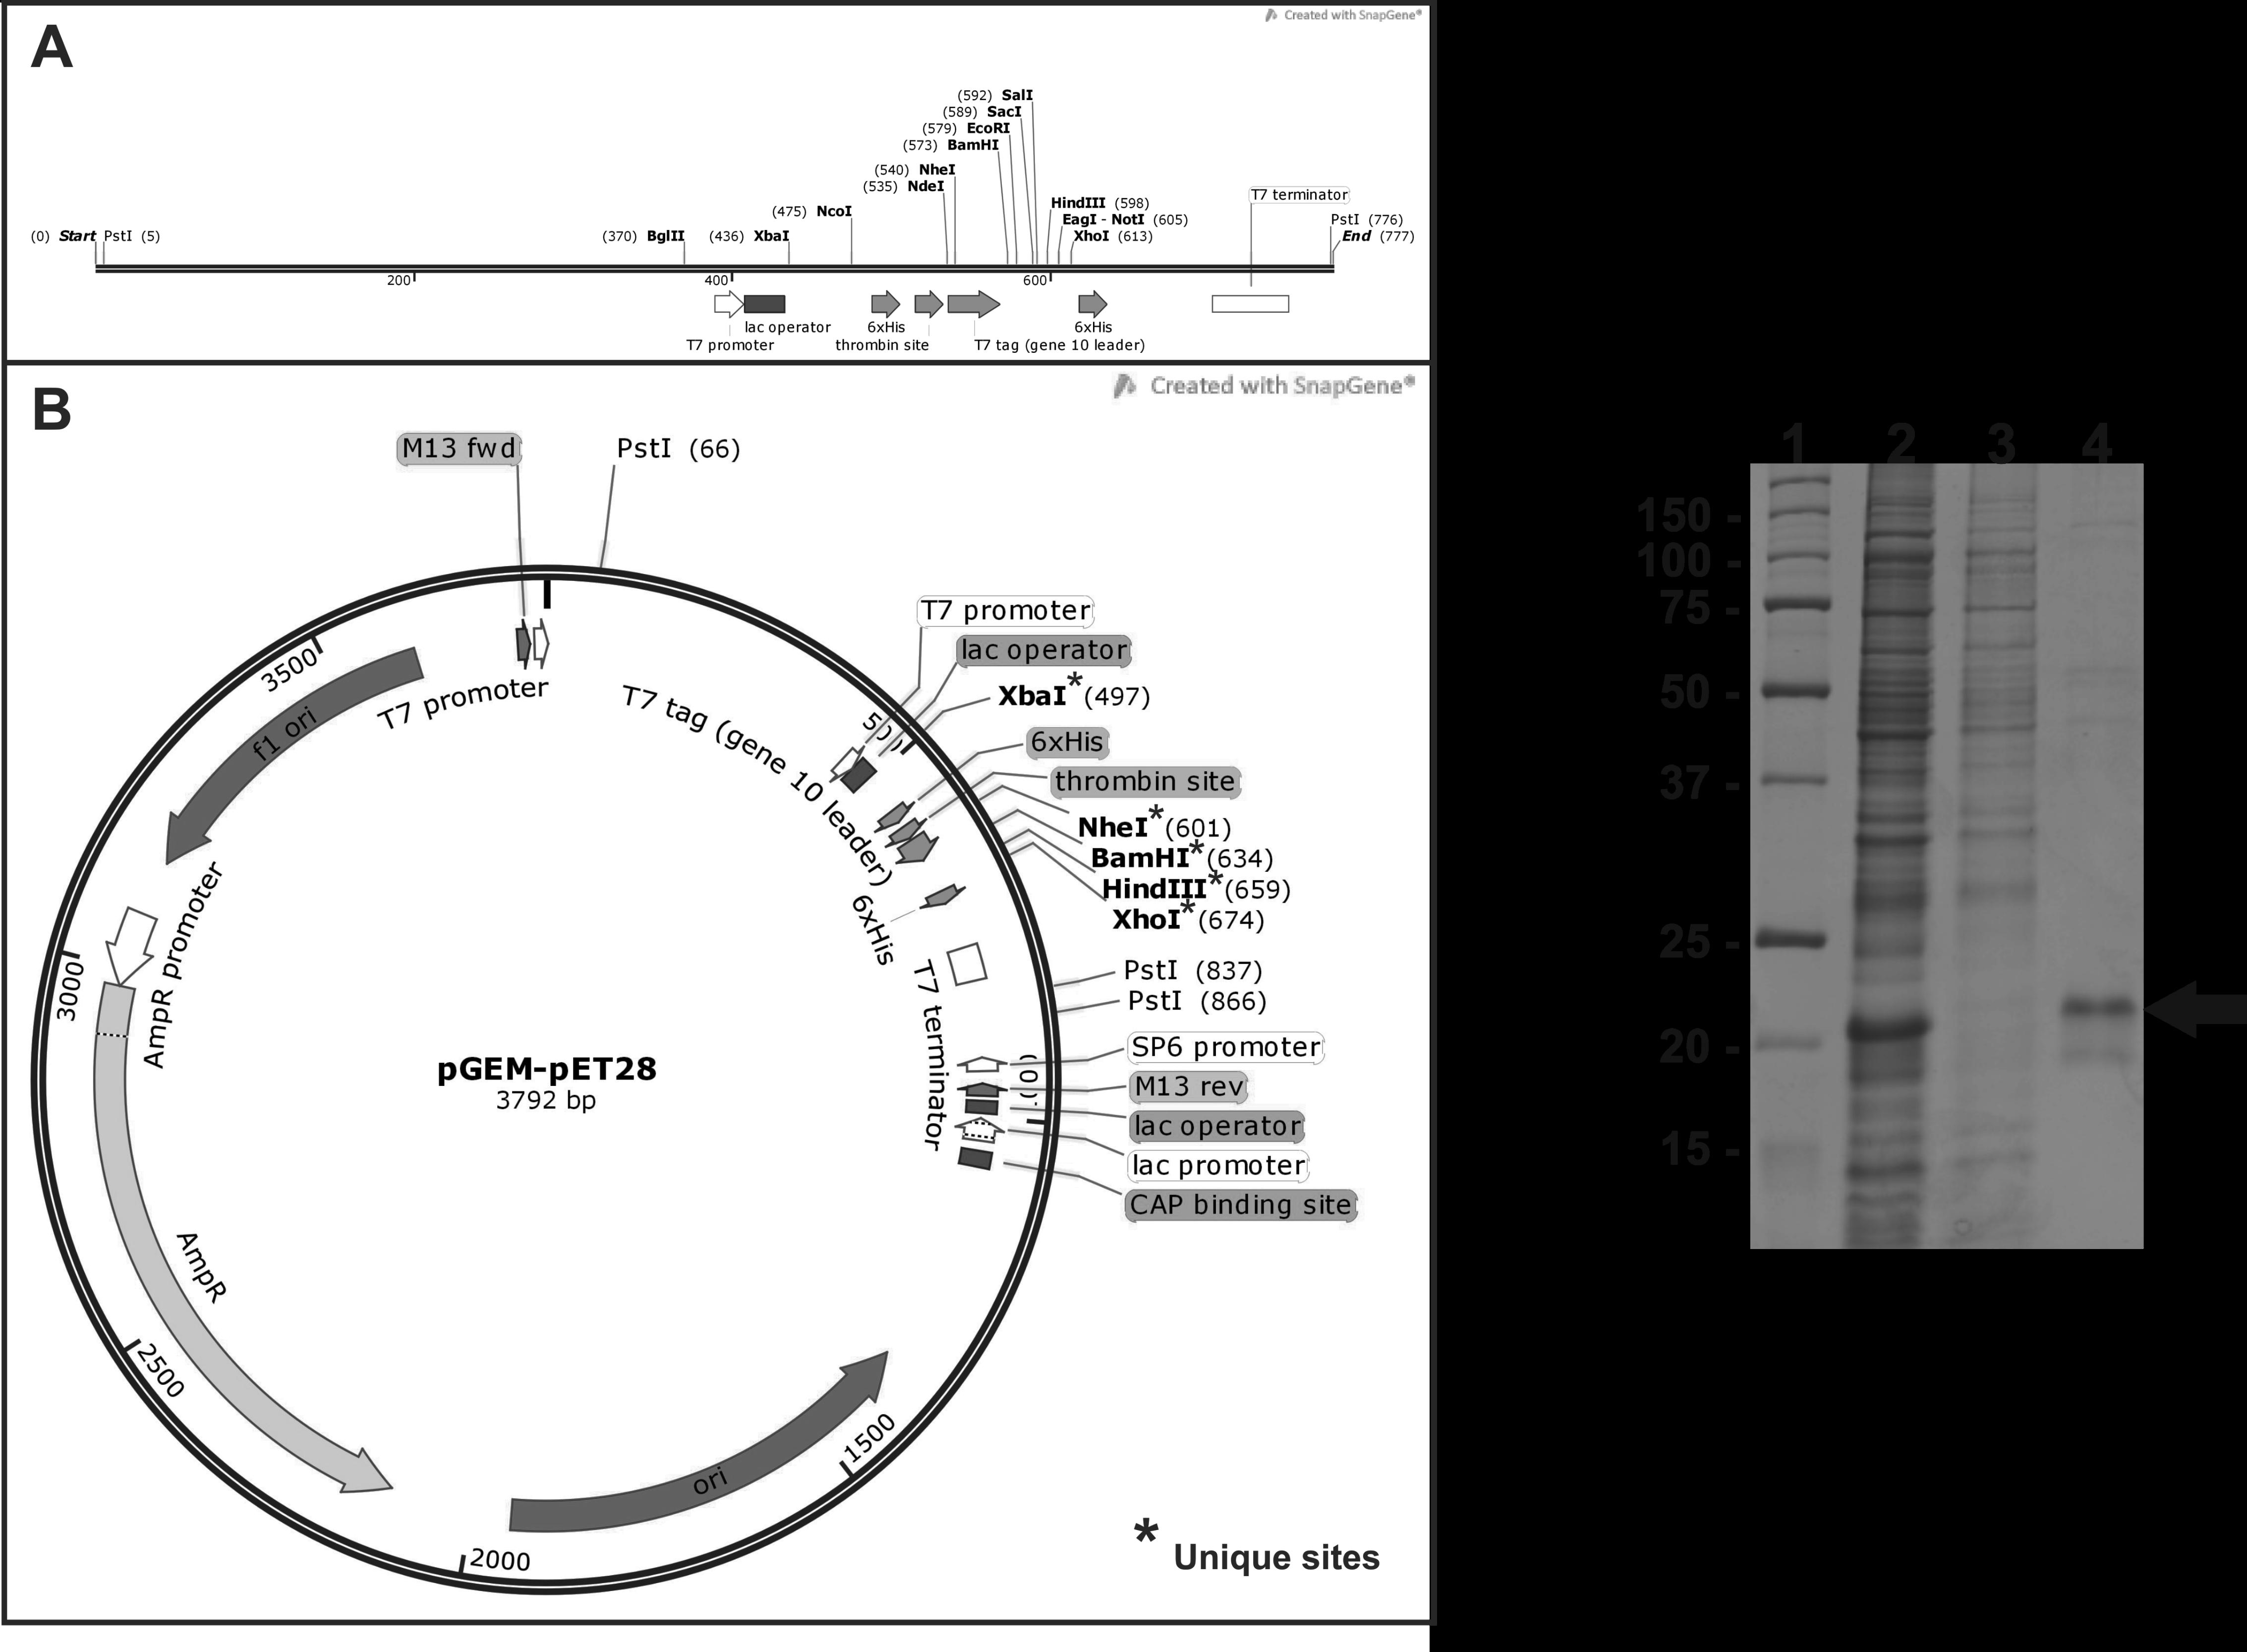 picture A hybrid plasmid pGEM